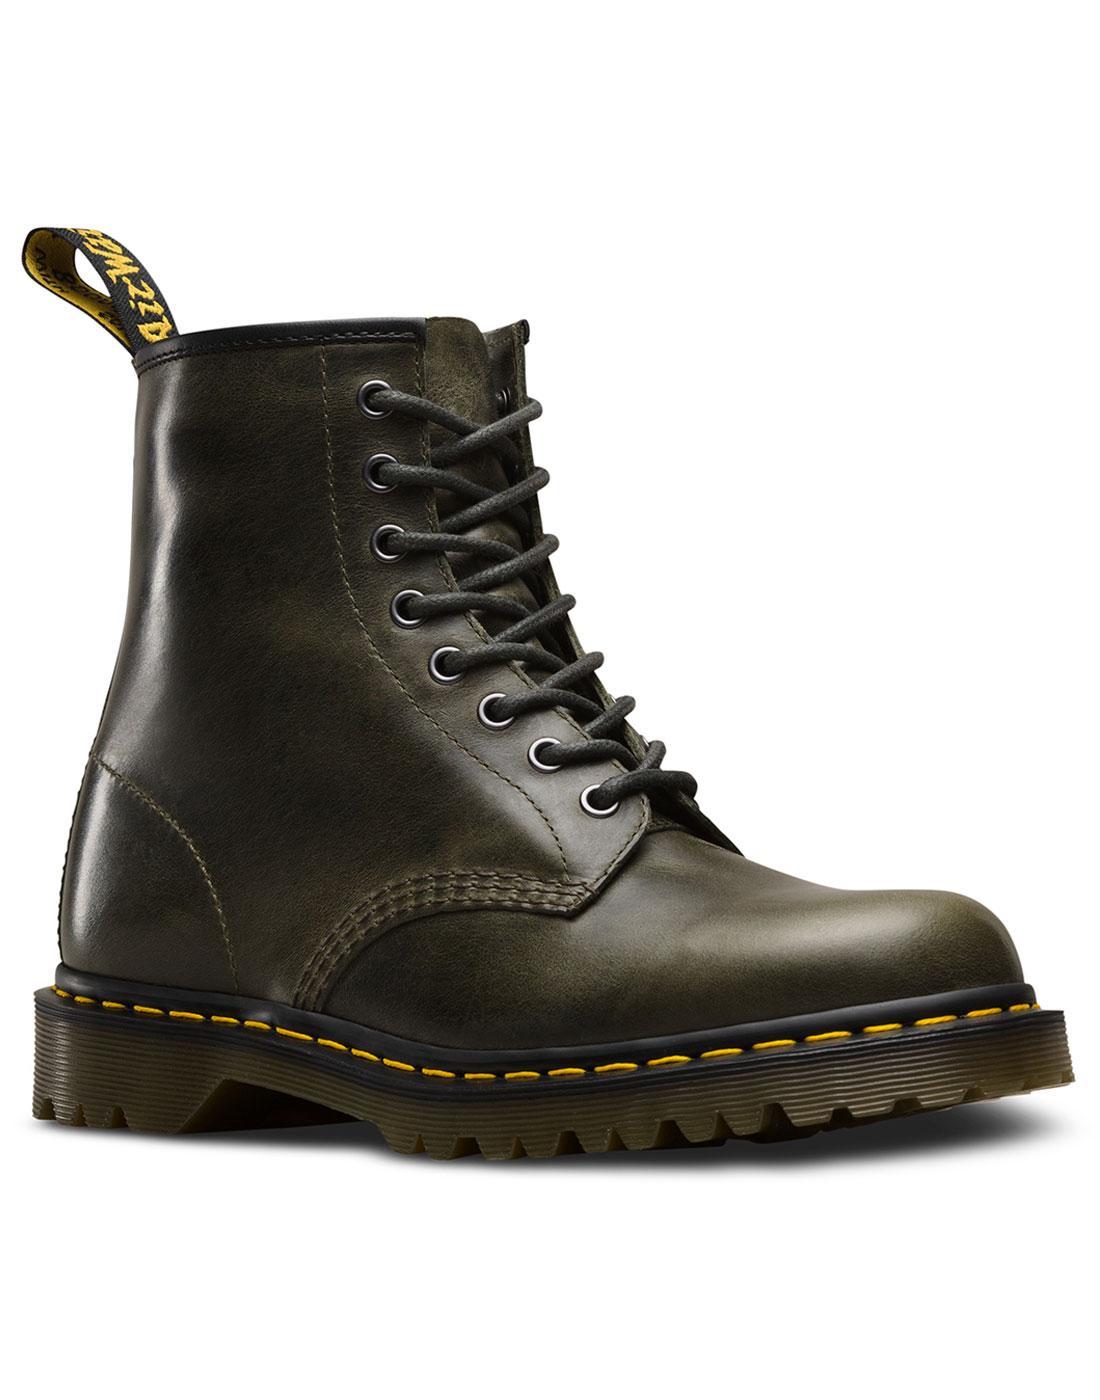 1460 Orleans DR MARTENS Retro 8 Eyelet Boots DT